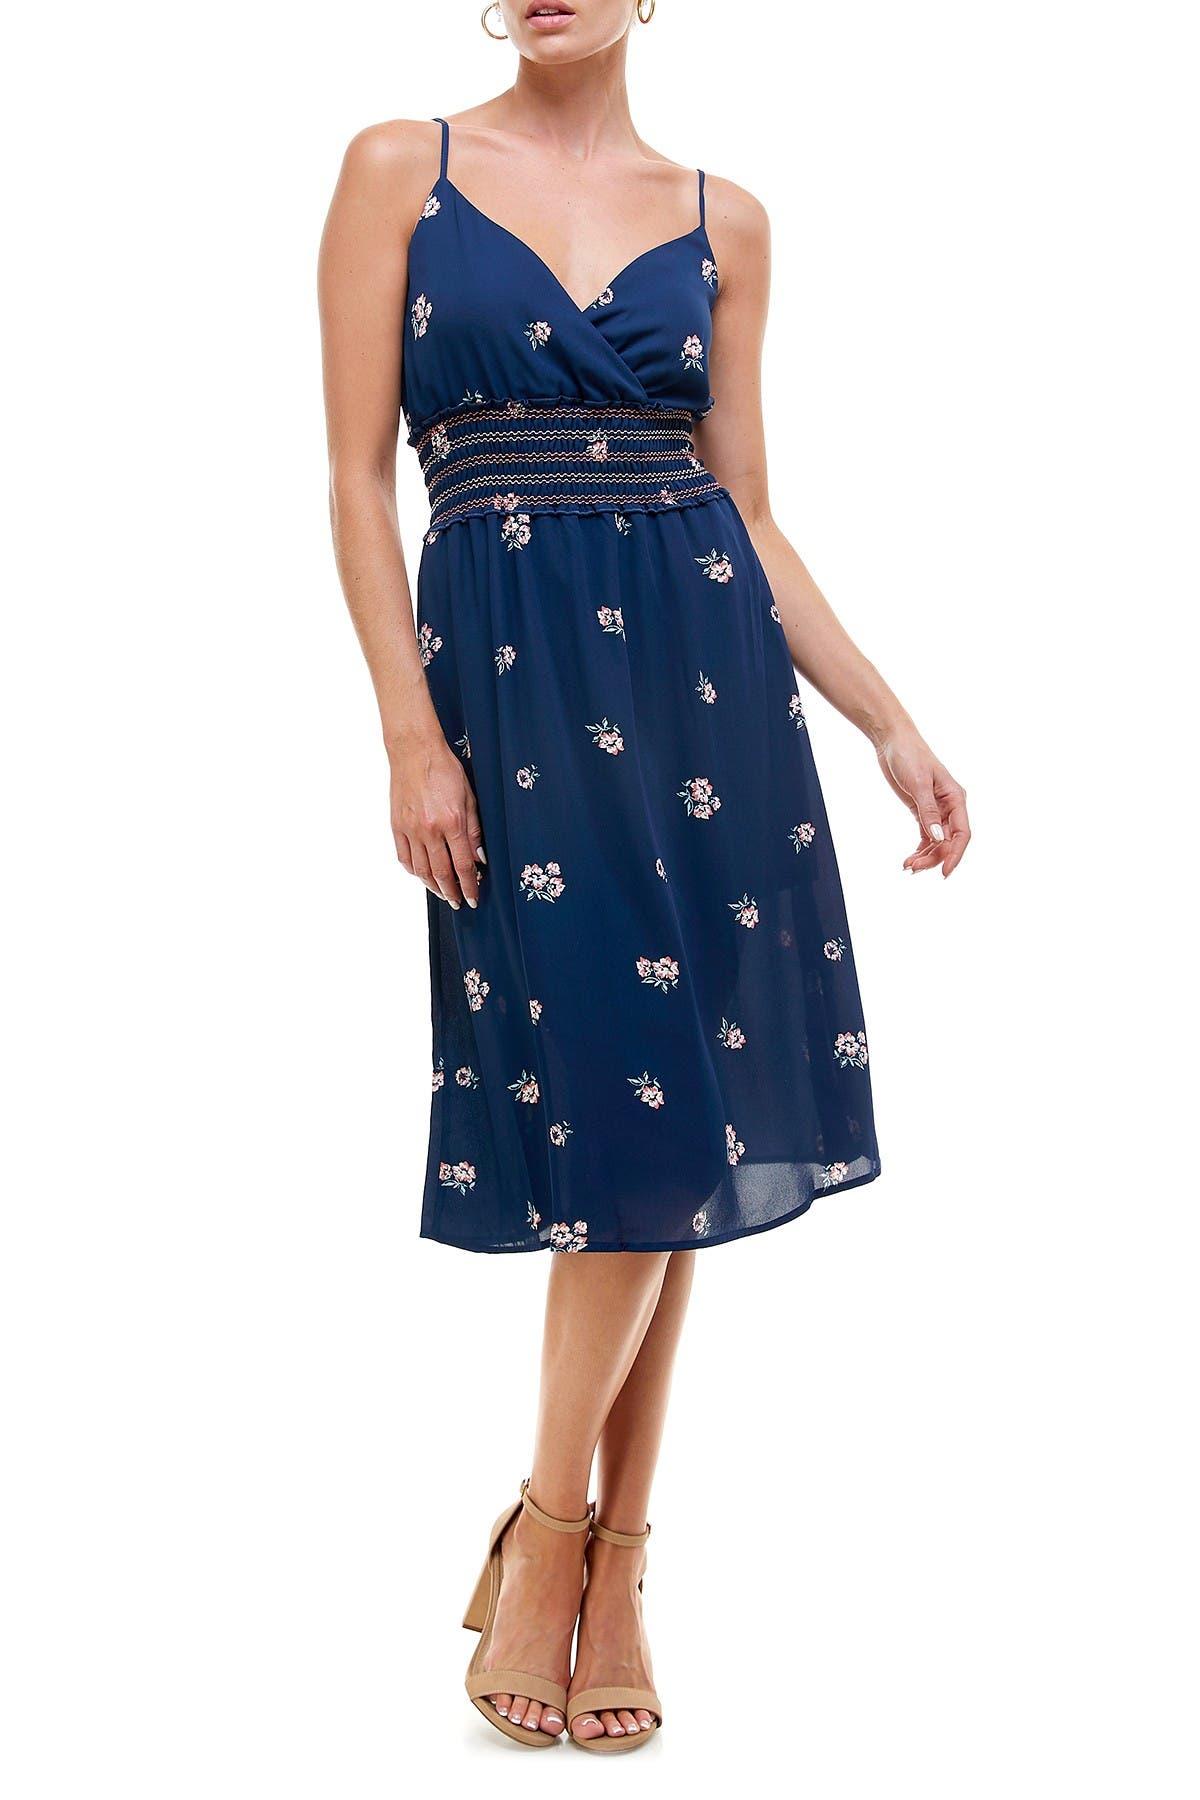 Image of ROW A Smocked Waist Midi Dress